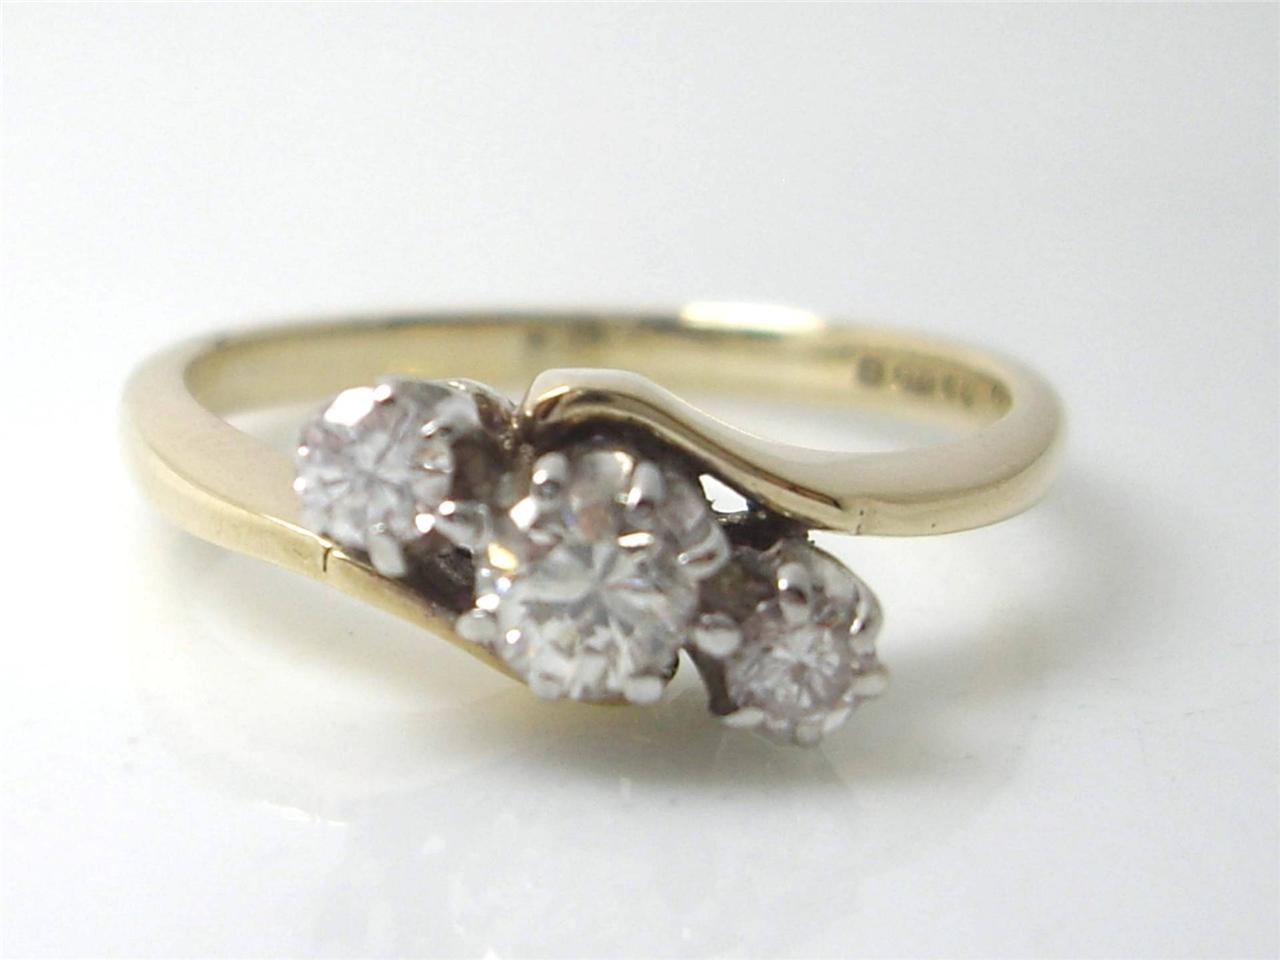 VS 25CT DIAMONDS 9K YELLOW GOLD TRILOGY WEDDING ENGAGEMENT RING SALE XMAS GI